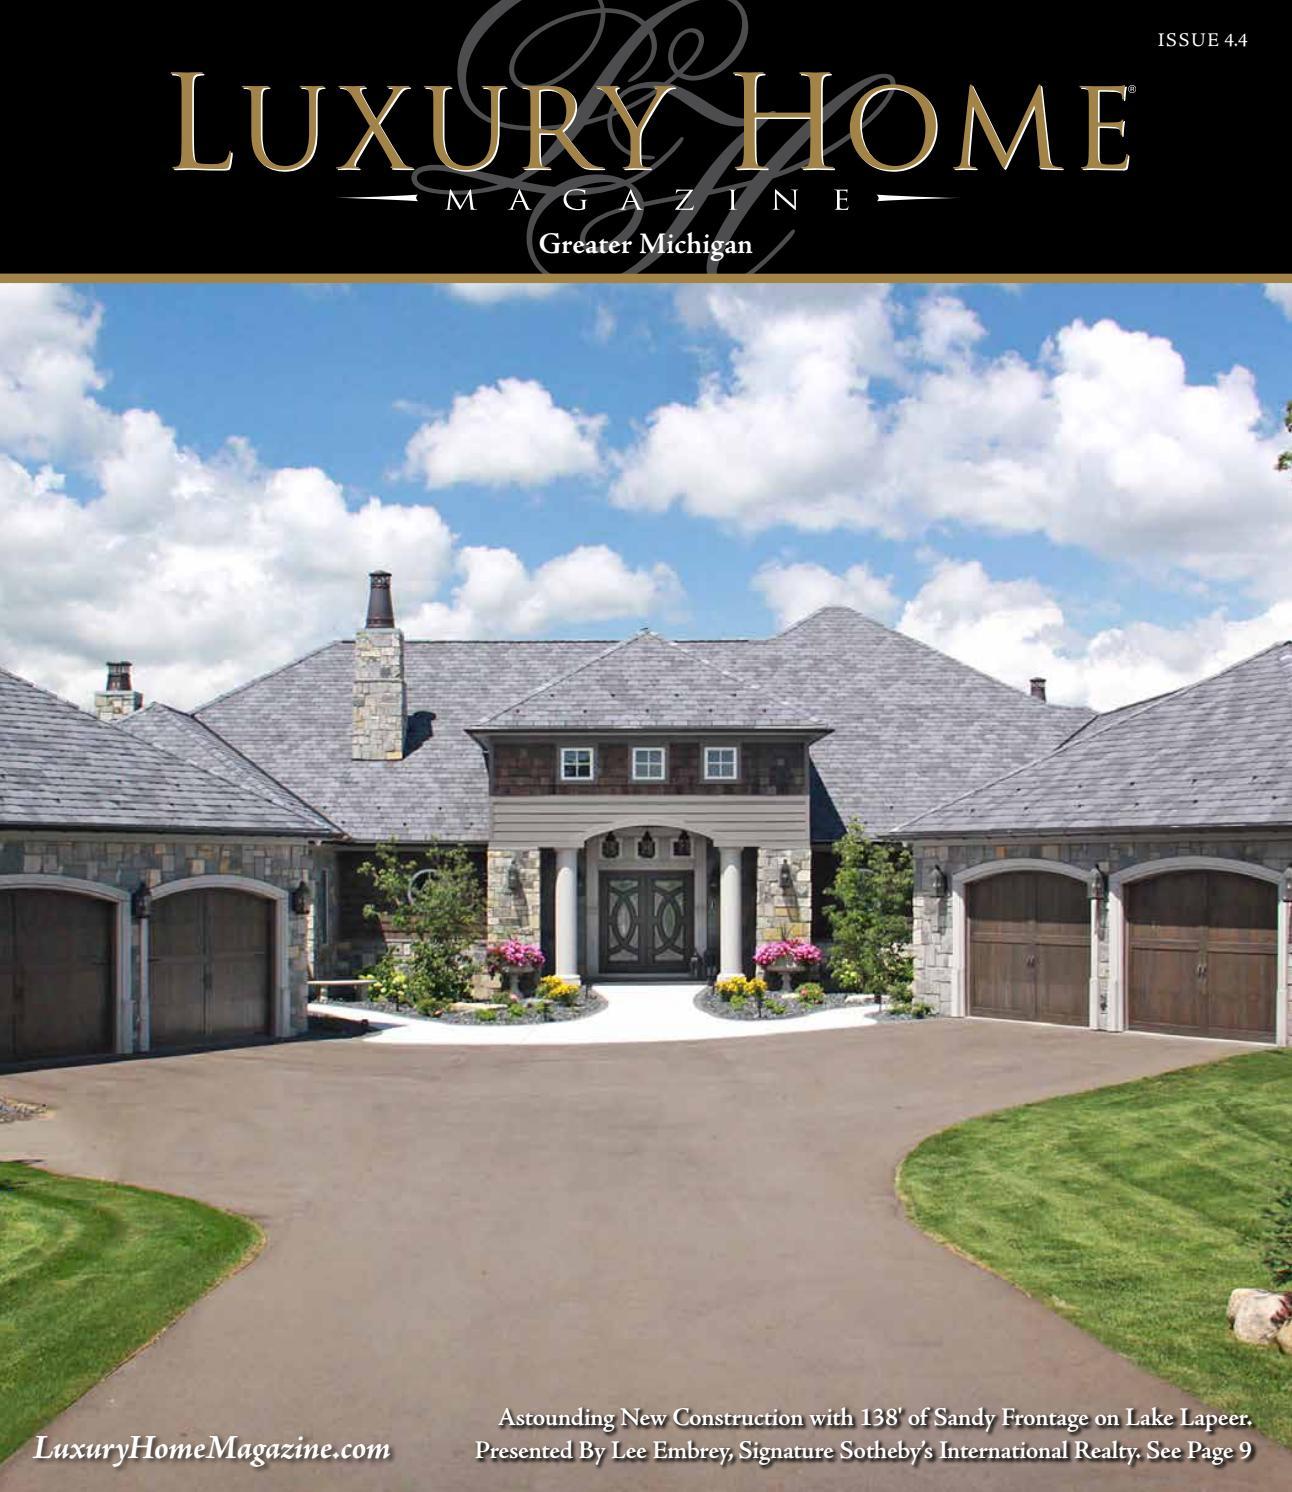 Country Club Apartments Birmingham Al: Luxury Home Magazine Michigan Issue 4.4 By Luxury Home